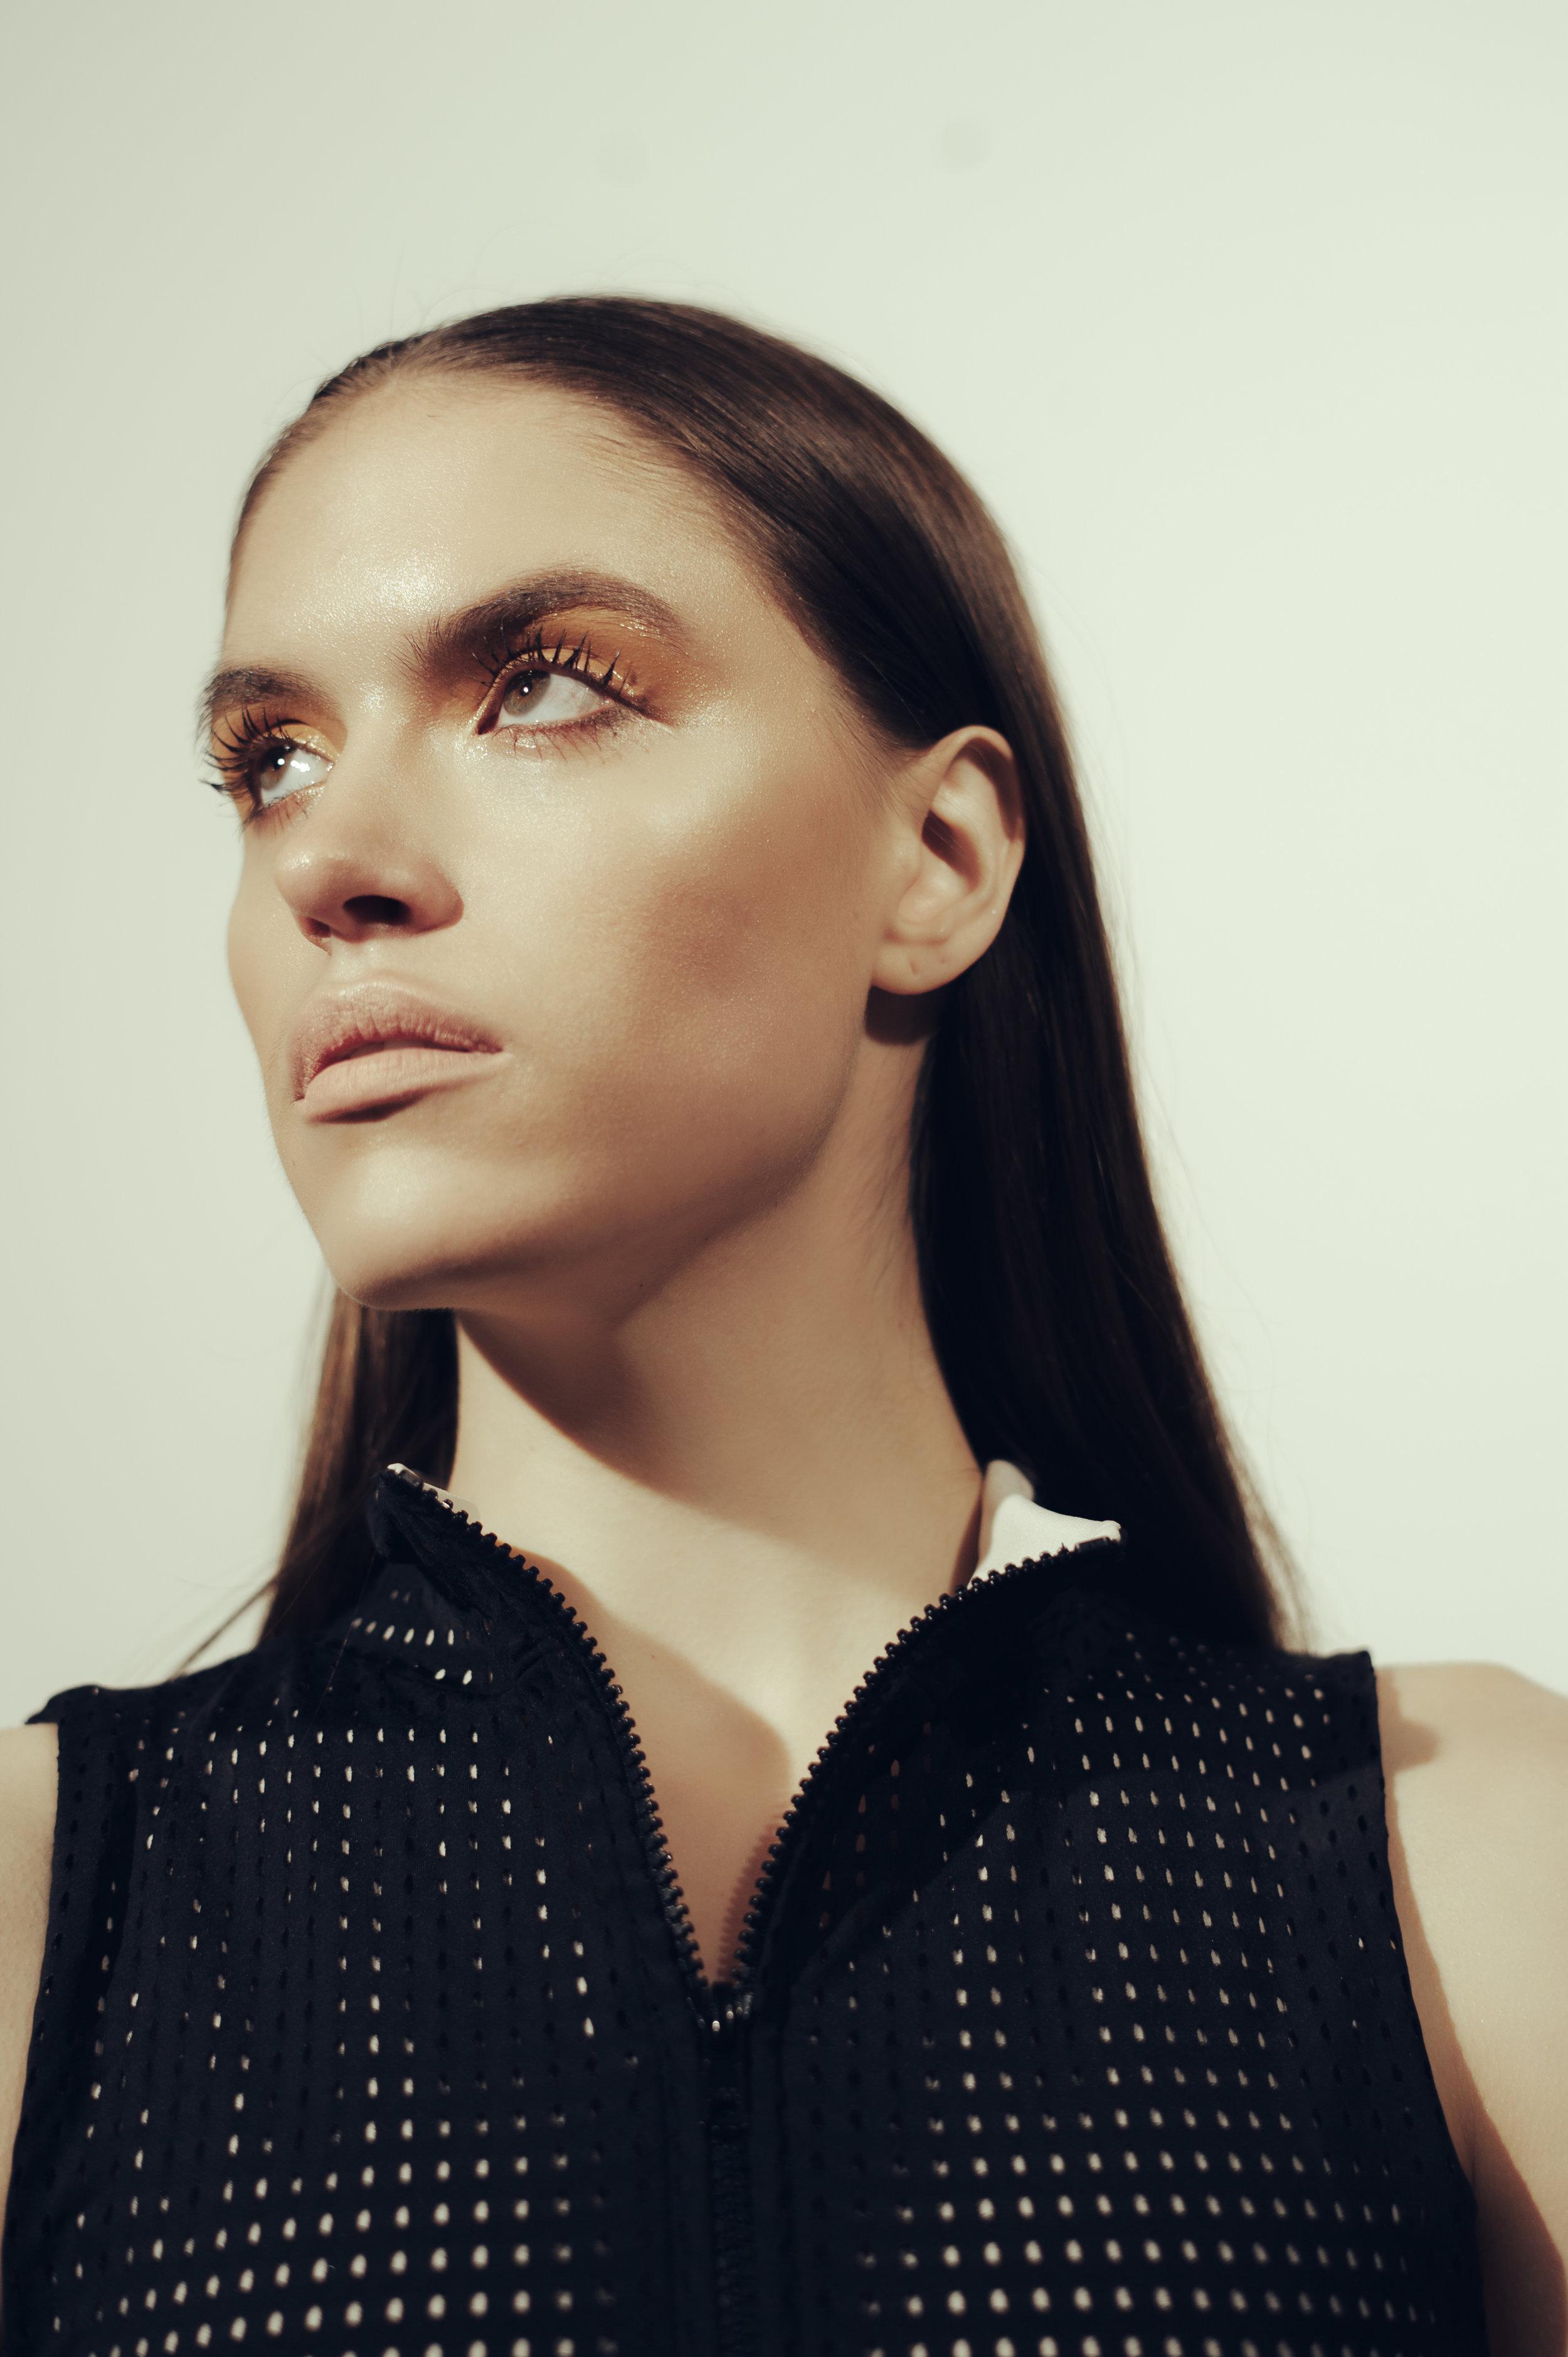 Photography: Ashley Camper Styling: Liz Gardner HMUA: Susan Frey Model: Sara Schuld of Ignite Models